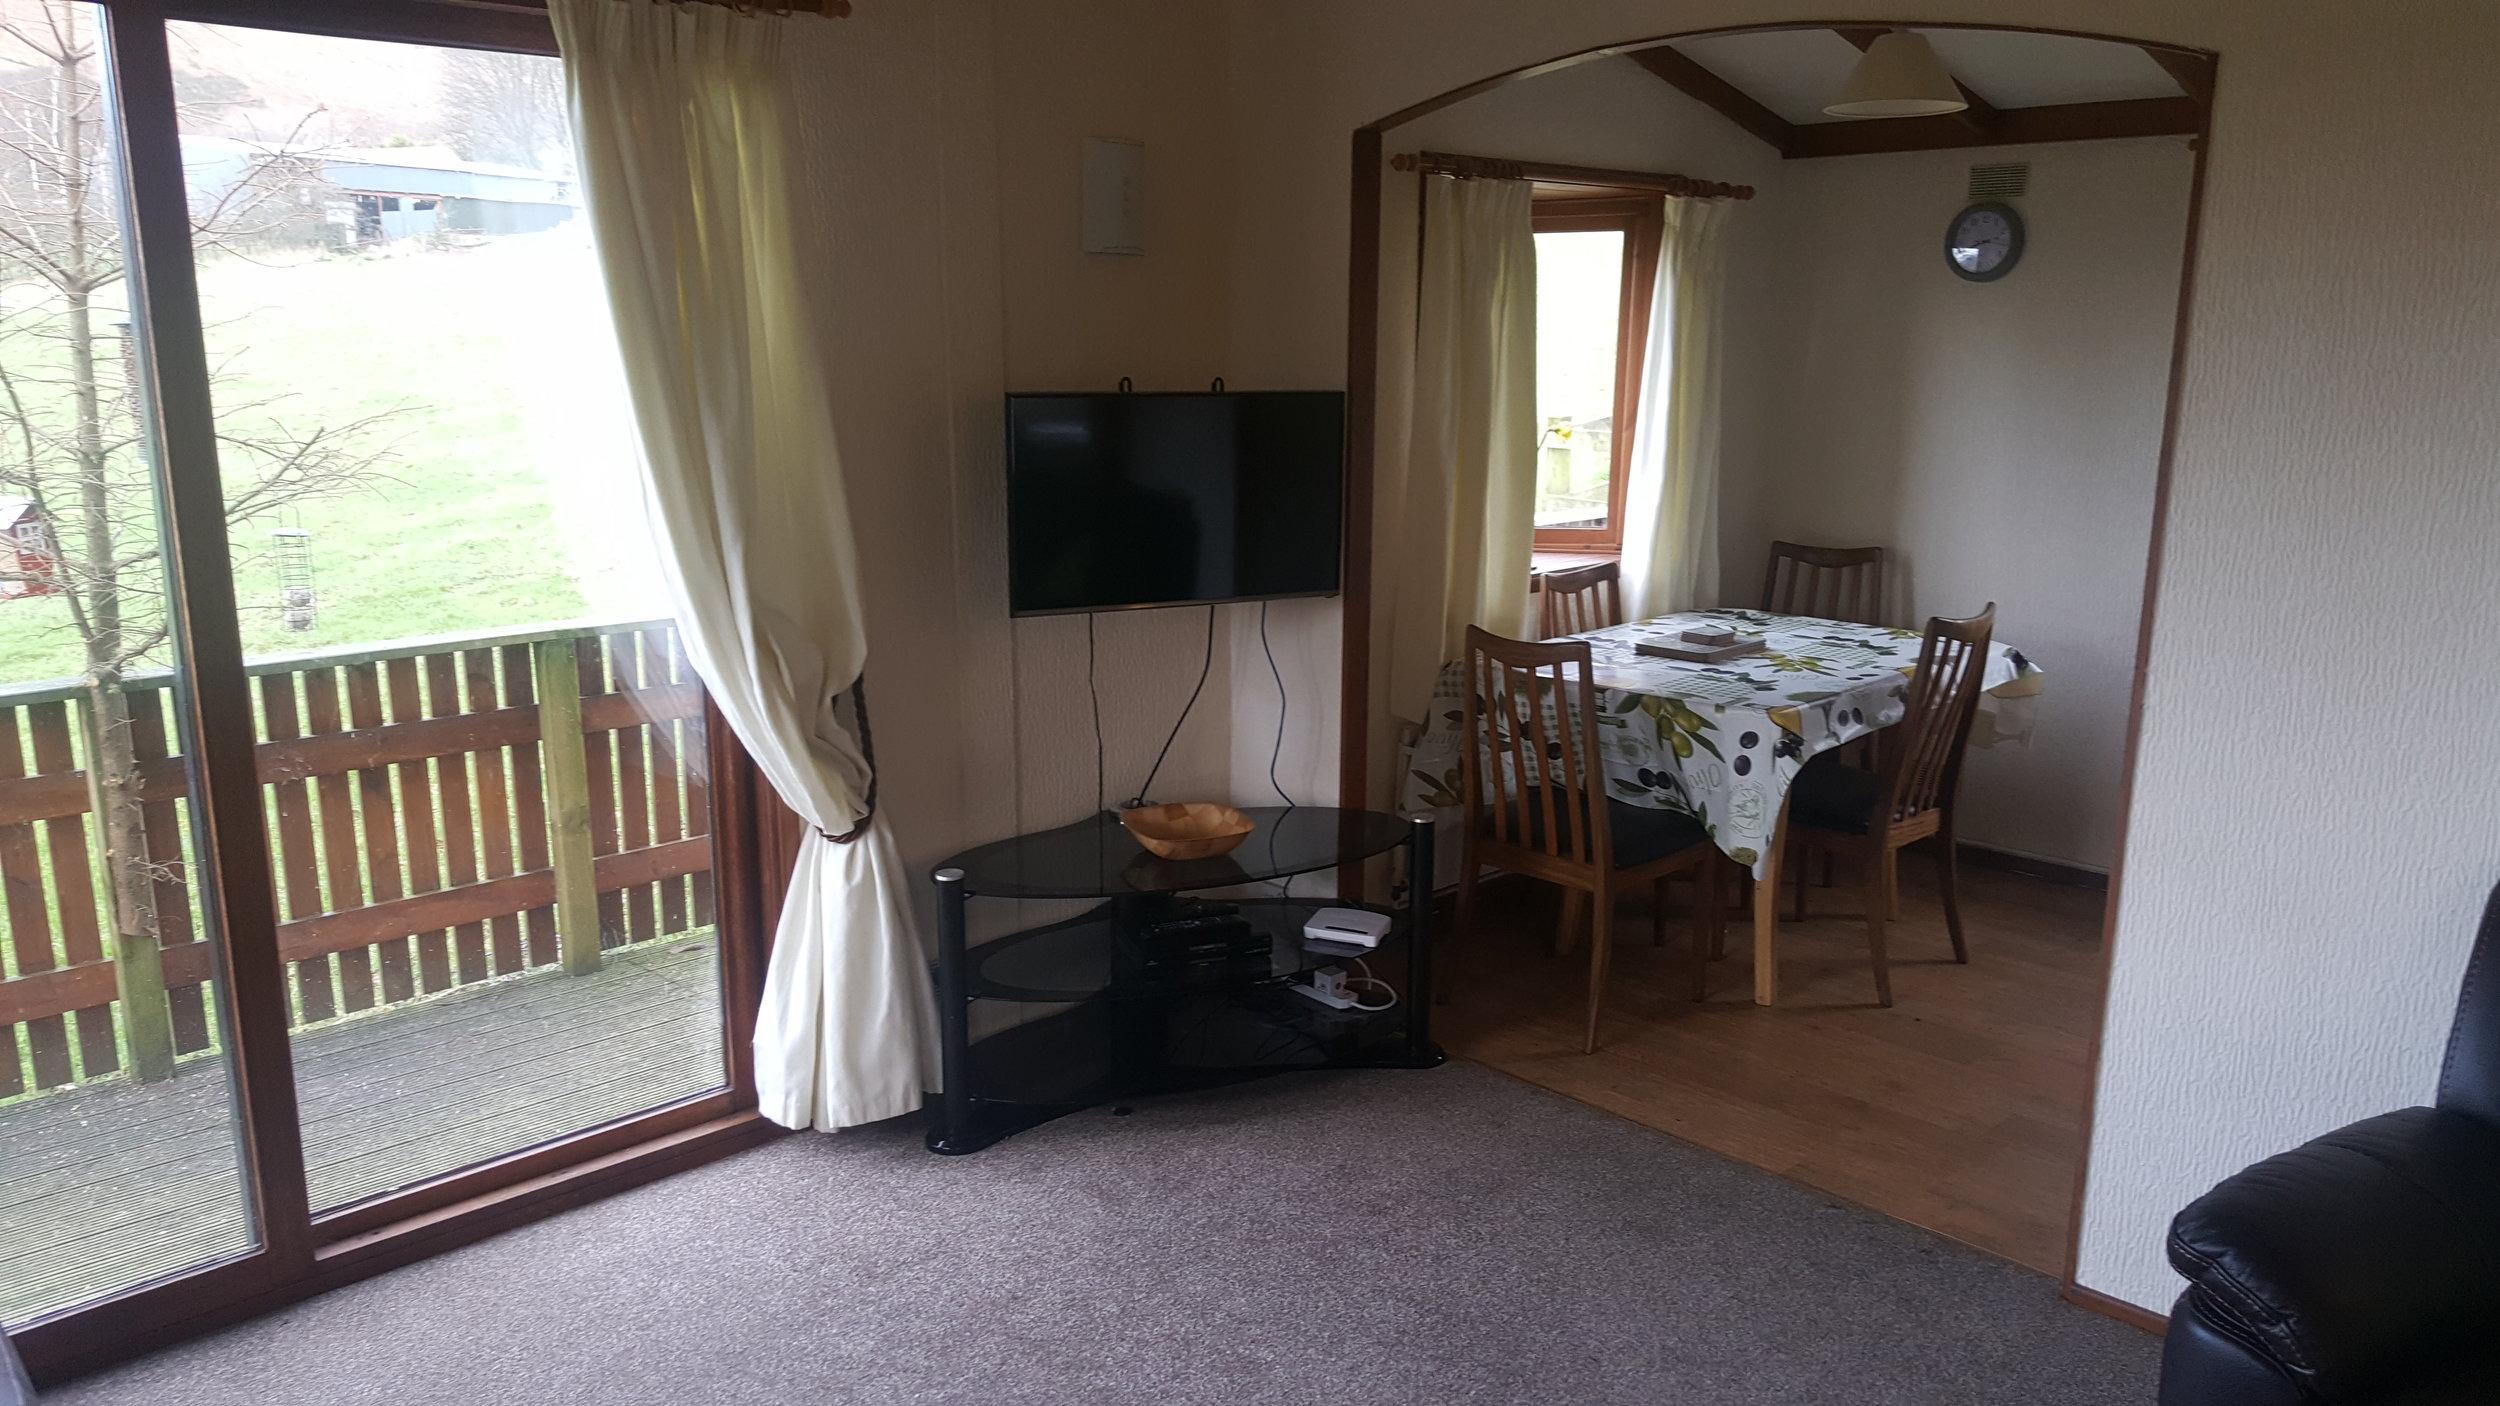 Living Room and Dining Room - Lodge Lorton Vale Caravans lortonvalecaravans.co.uk